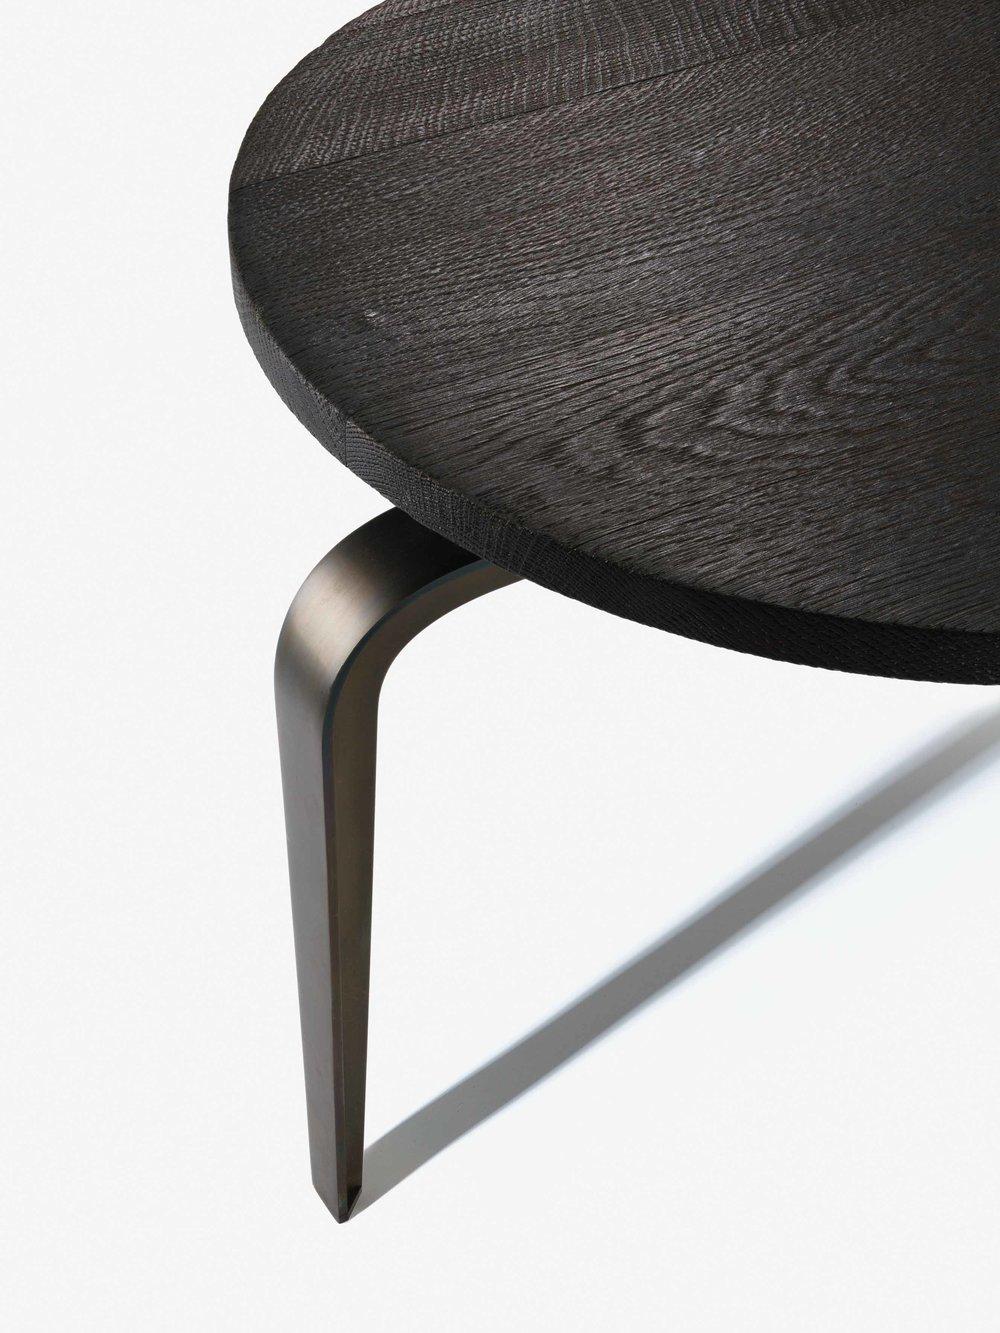 2. FS Stool 'Untitled' Wood (detail).jpg